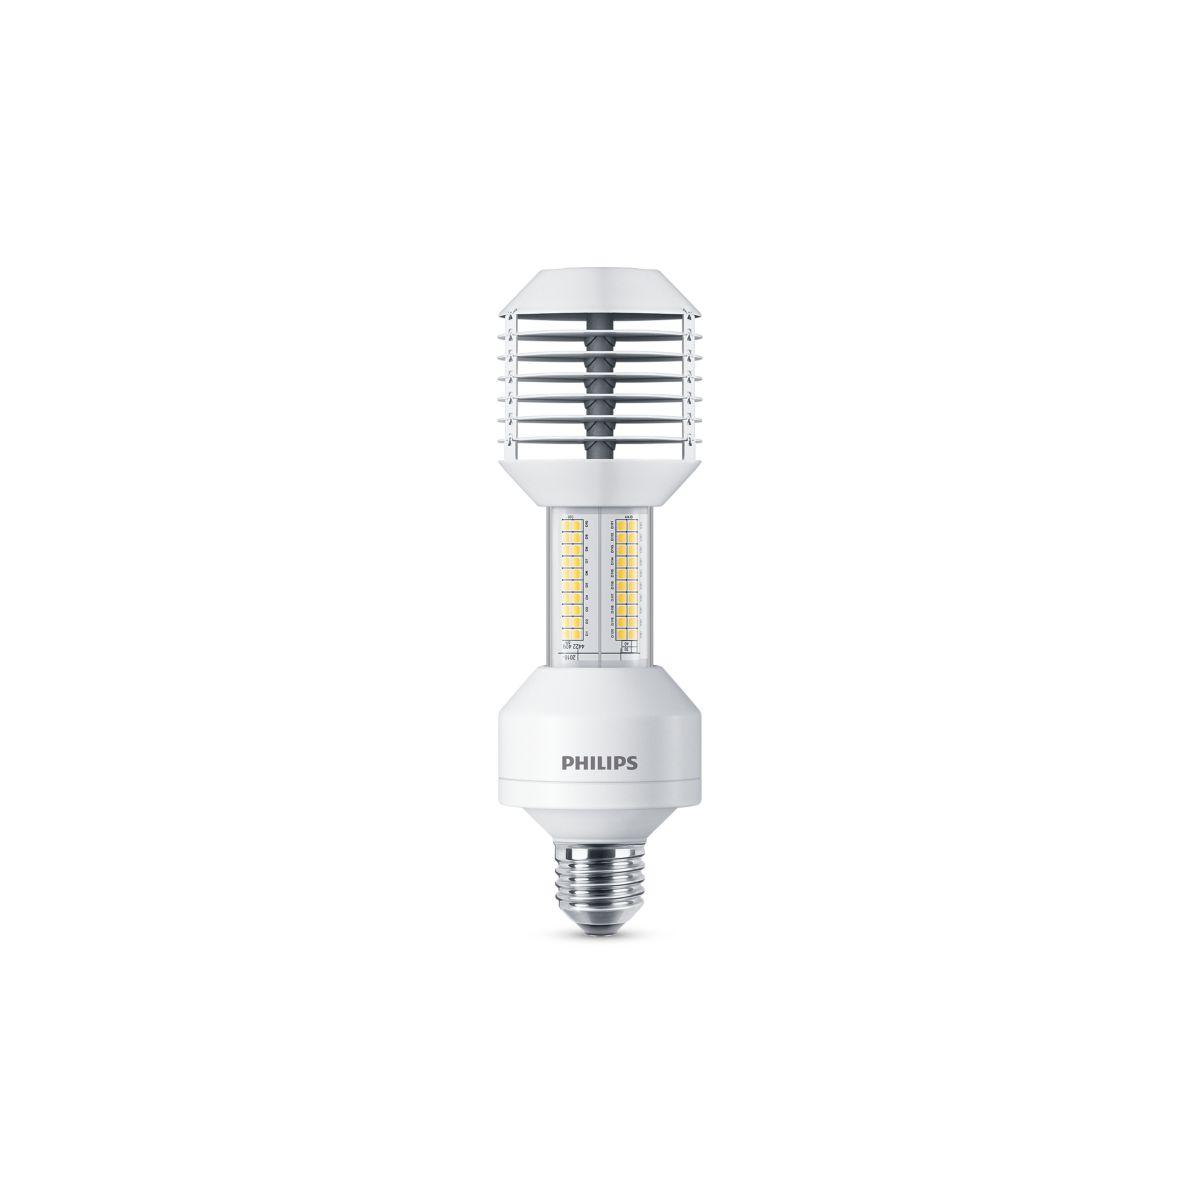 LED als Alternative für Entladungslampen